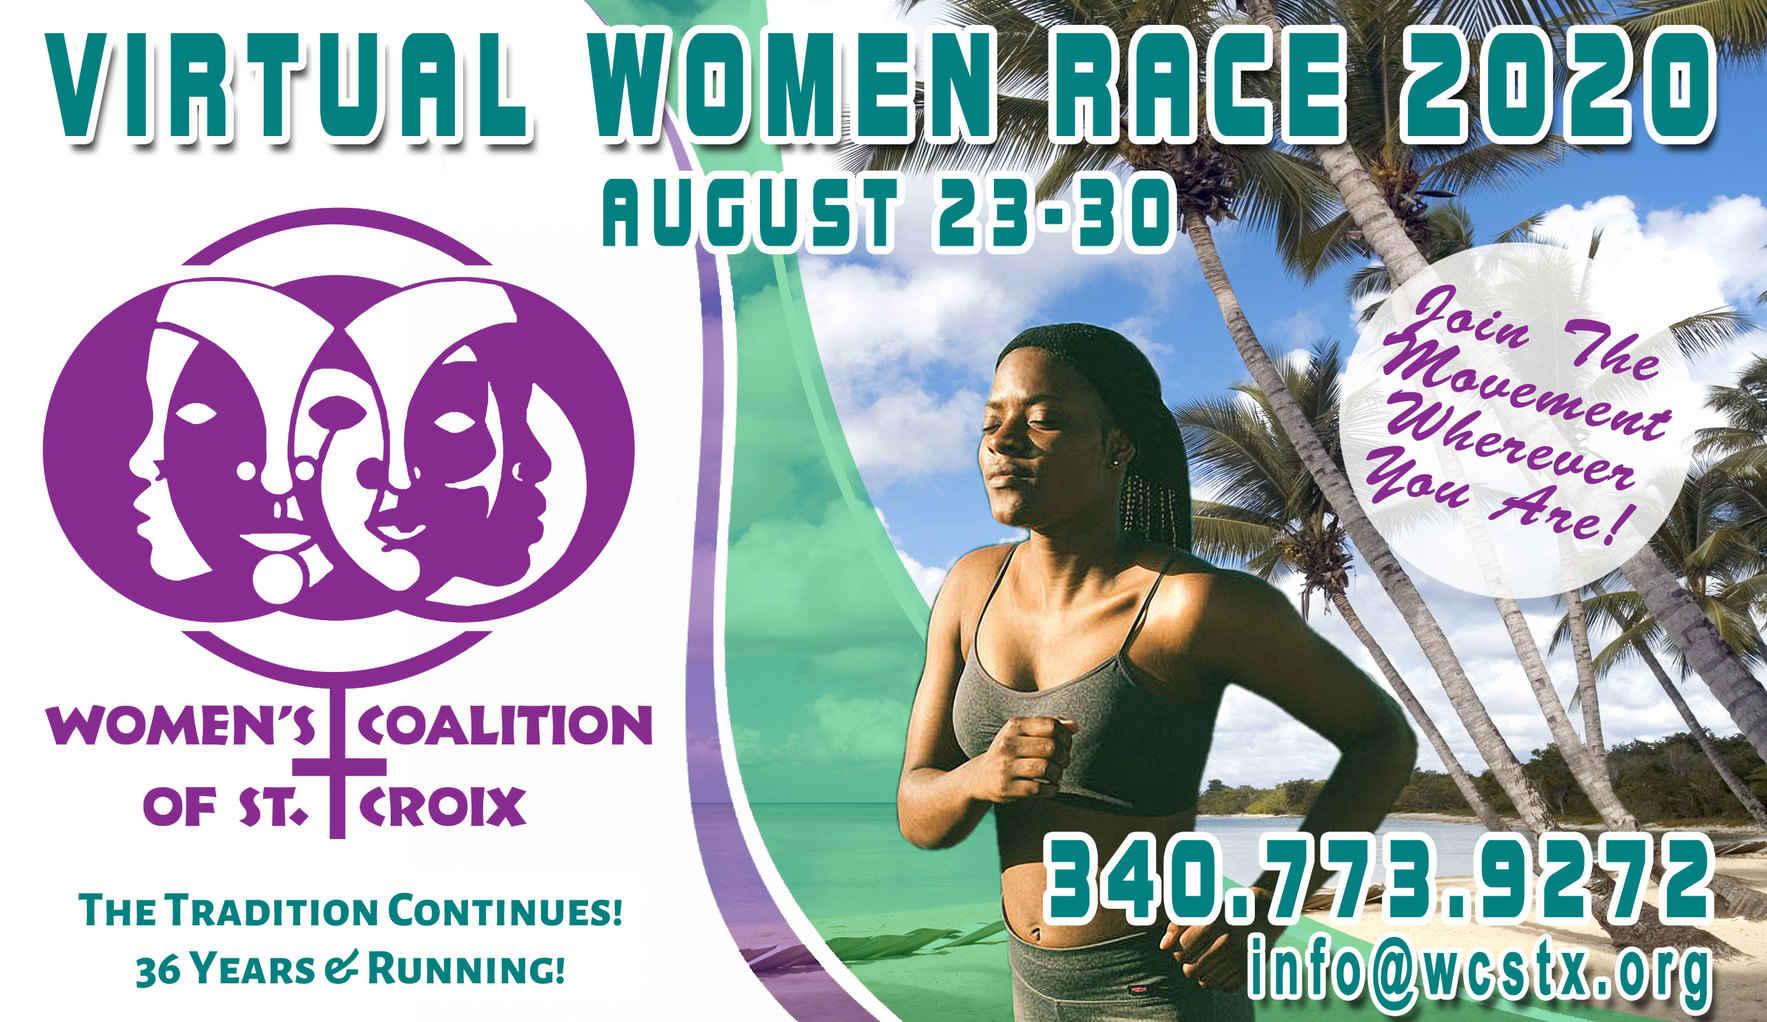 Virtual Women Race 2020 image